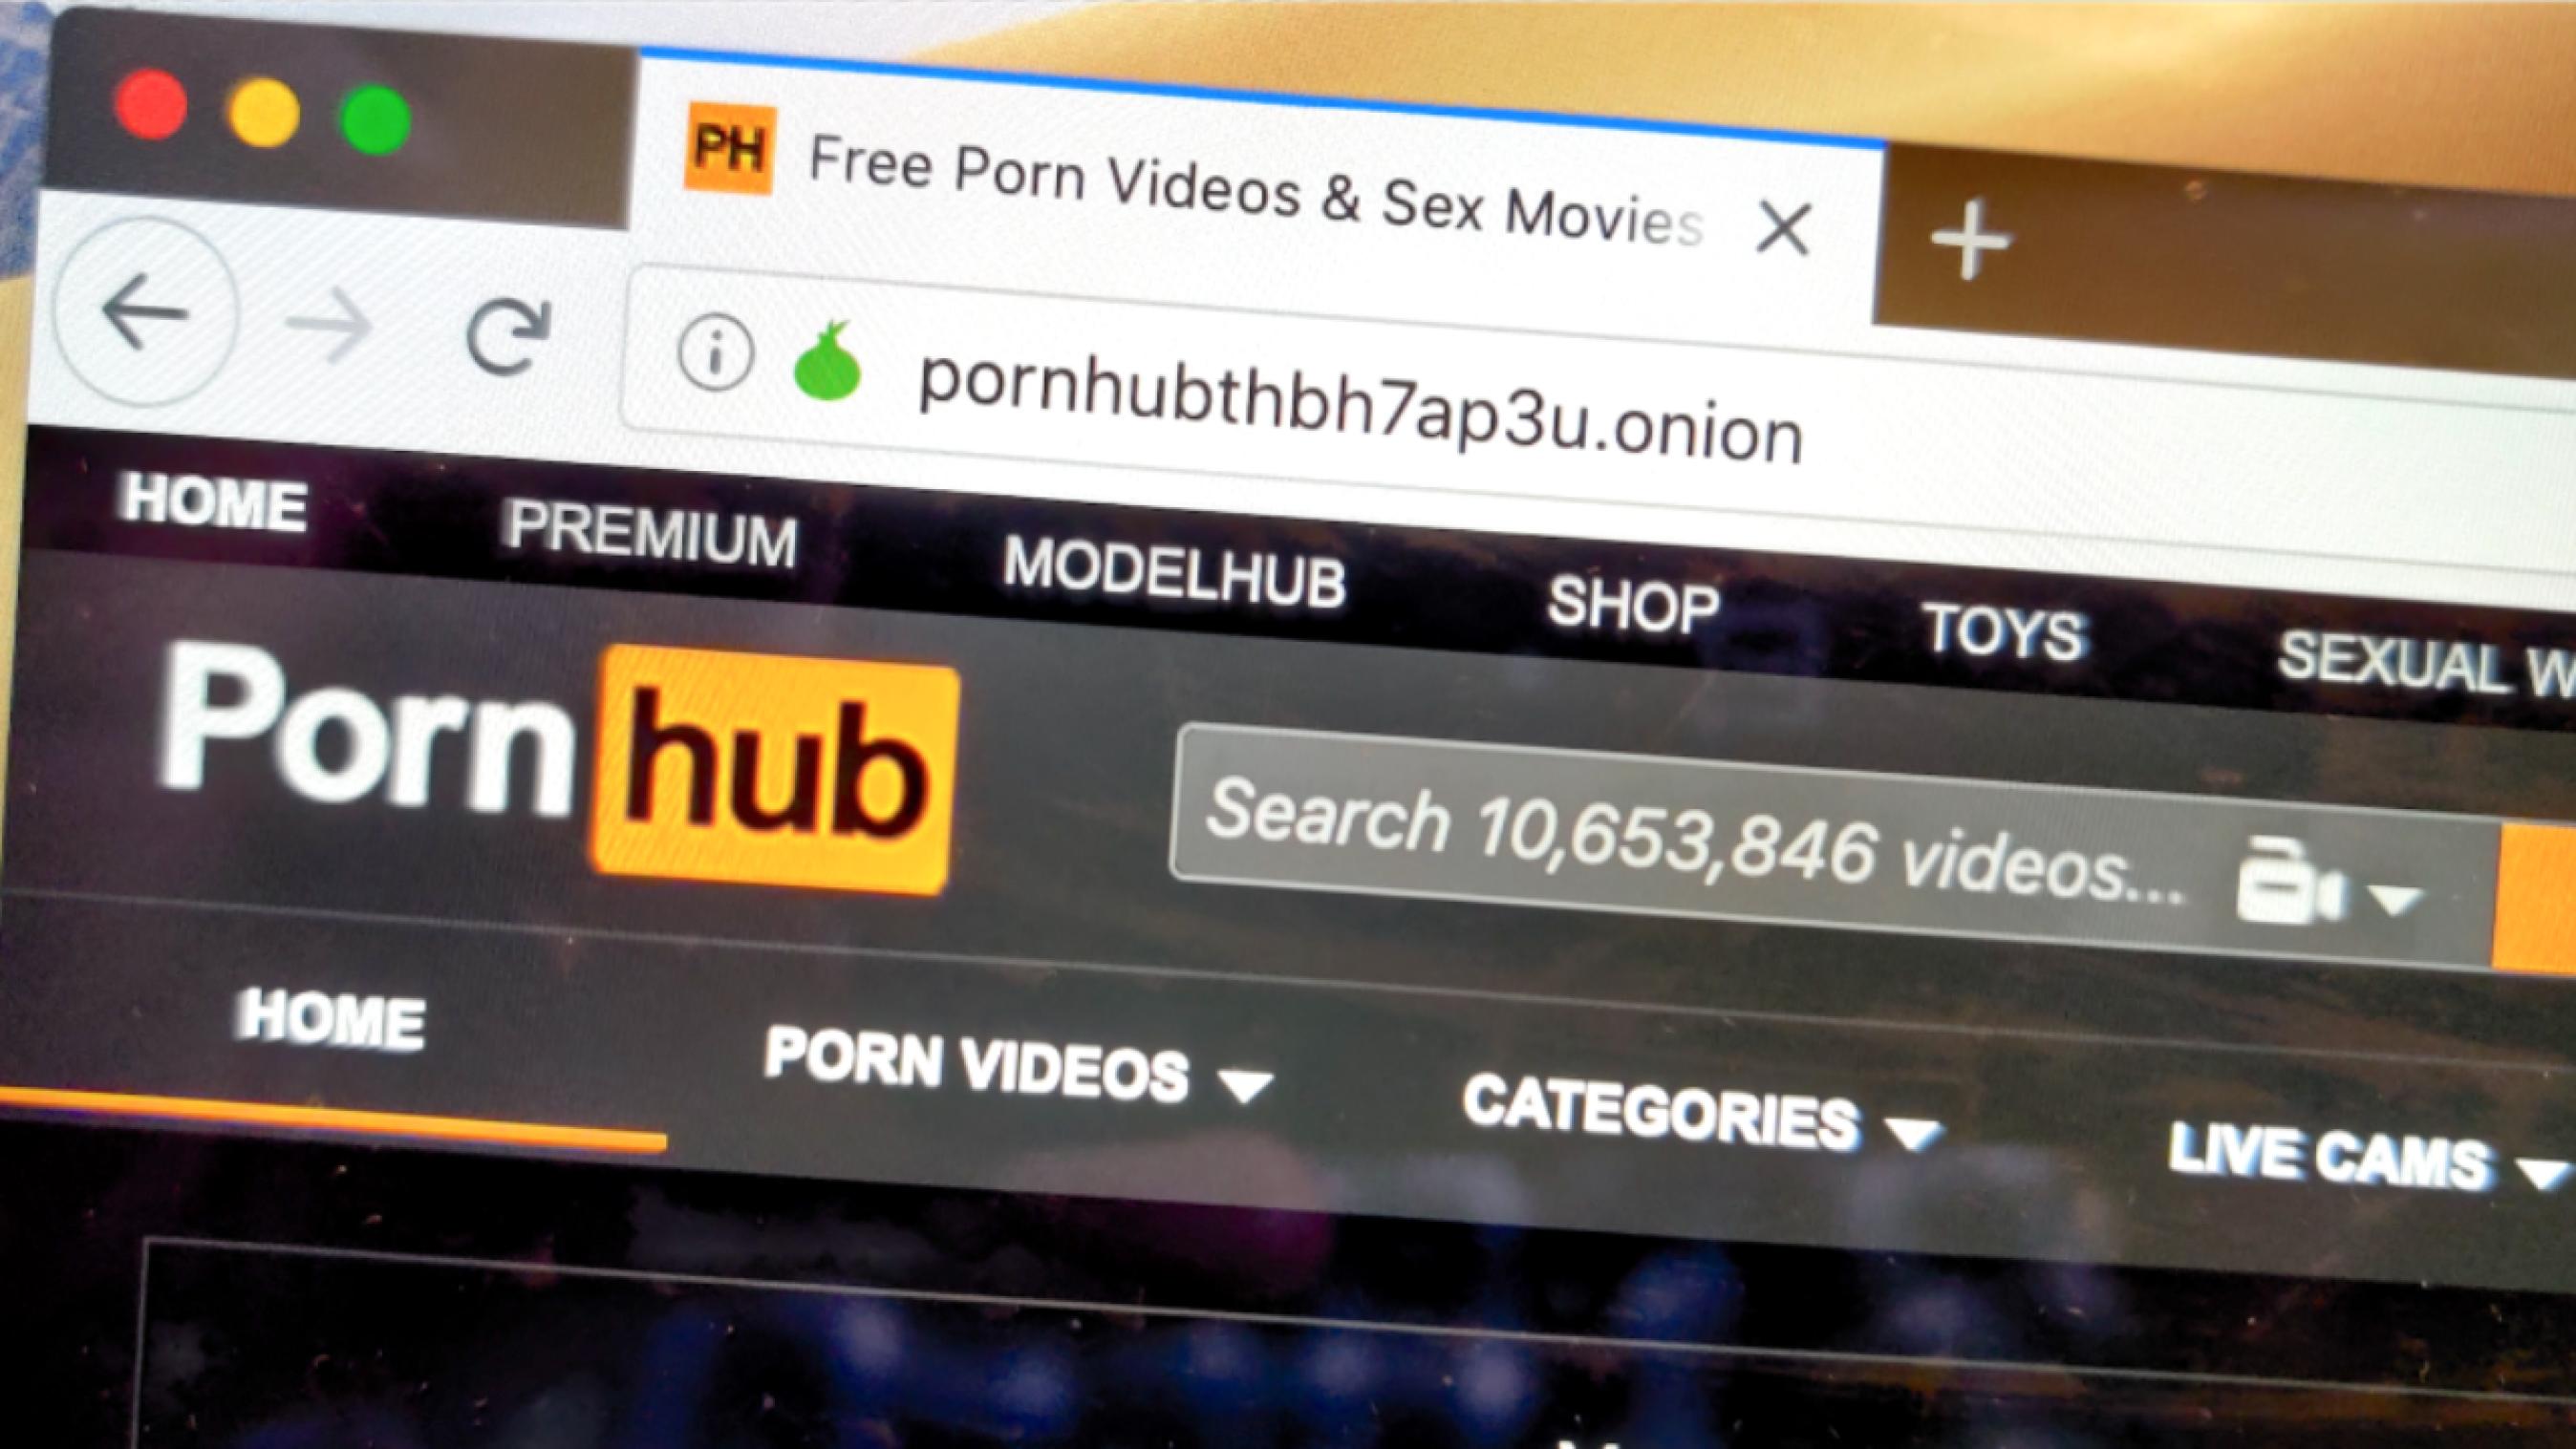 Search Free Porn Sites